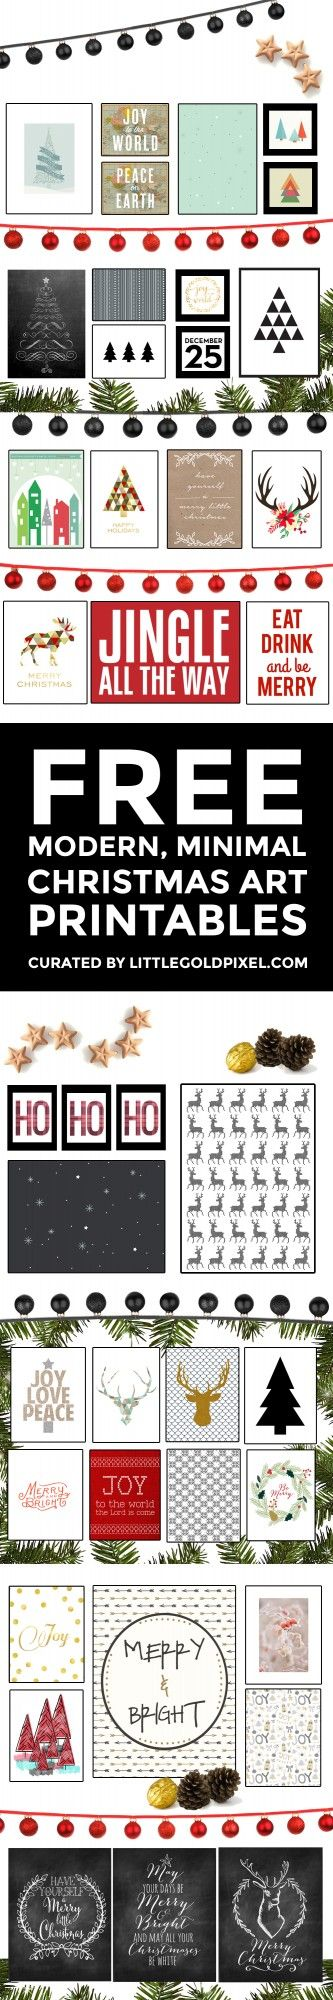 Free Art Printables • Design Resources •Little Gold Pixel